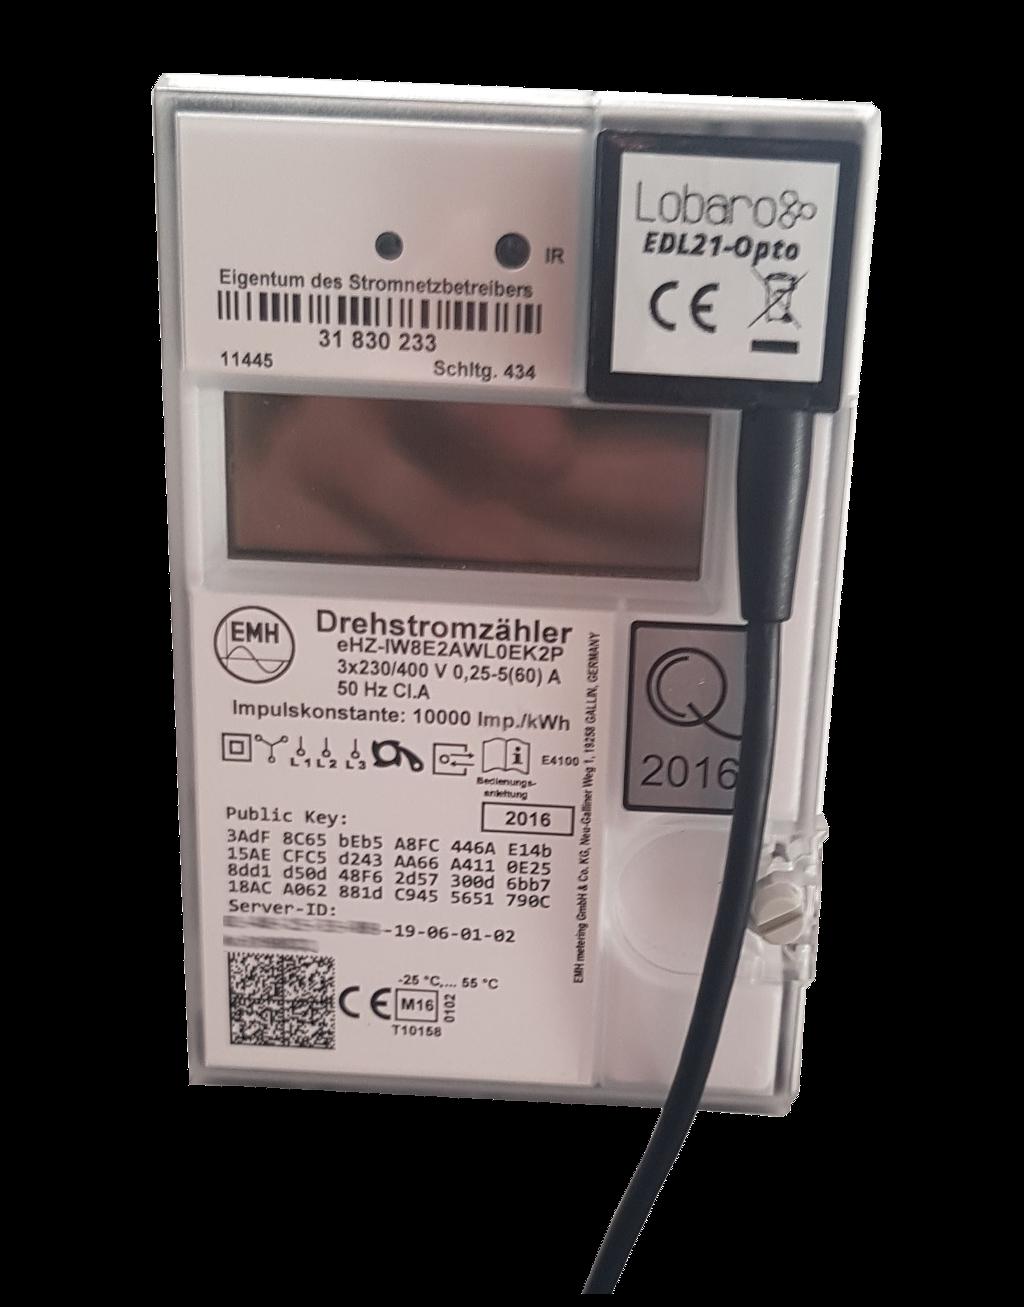 EDL21 Stromzähler Optokopf via LoRaWAN